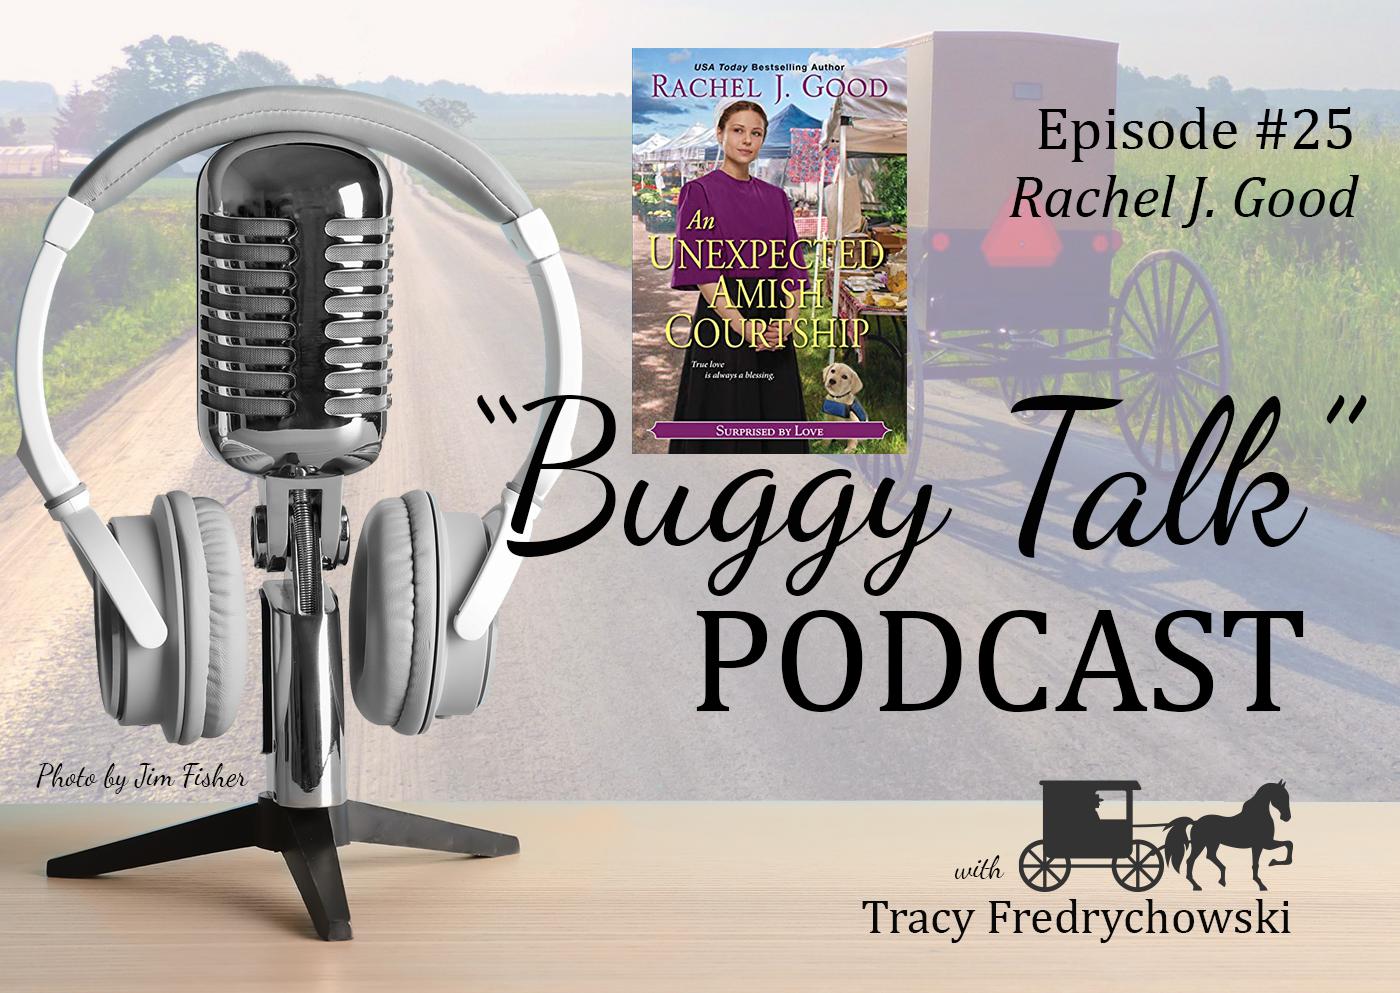 Episode 25 – Rachel J. Good – An Unexpected Amish Courtship